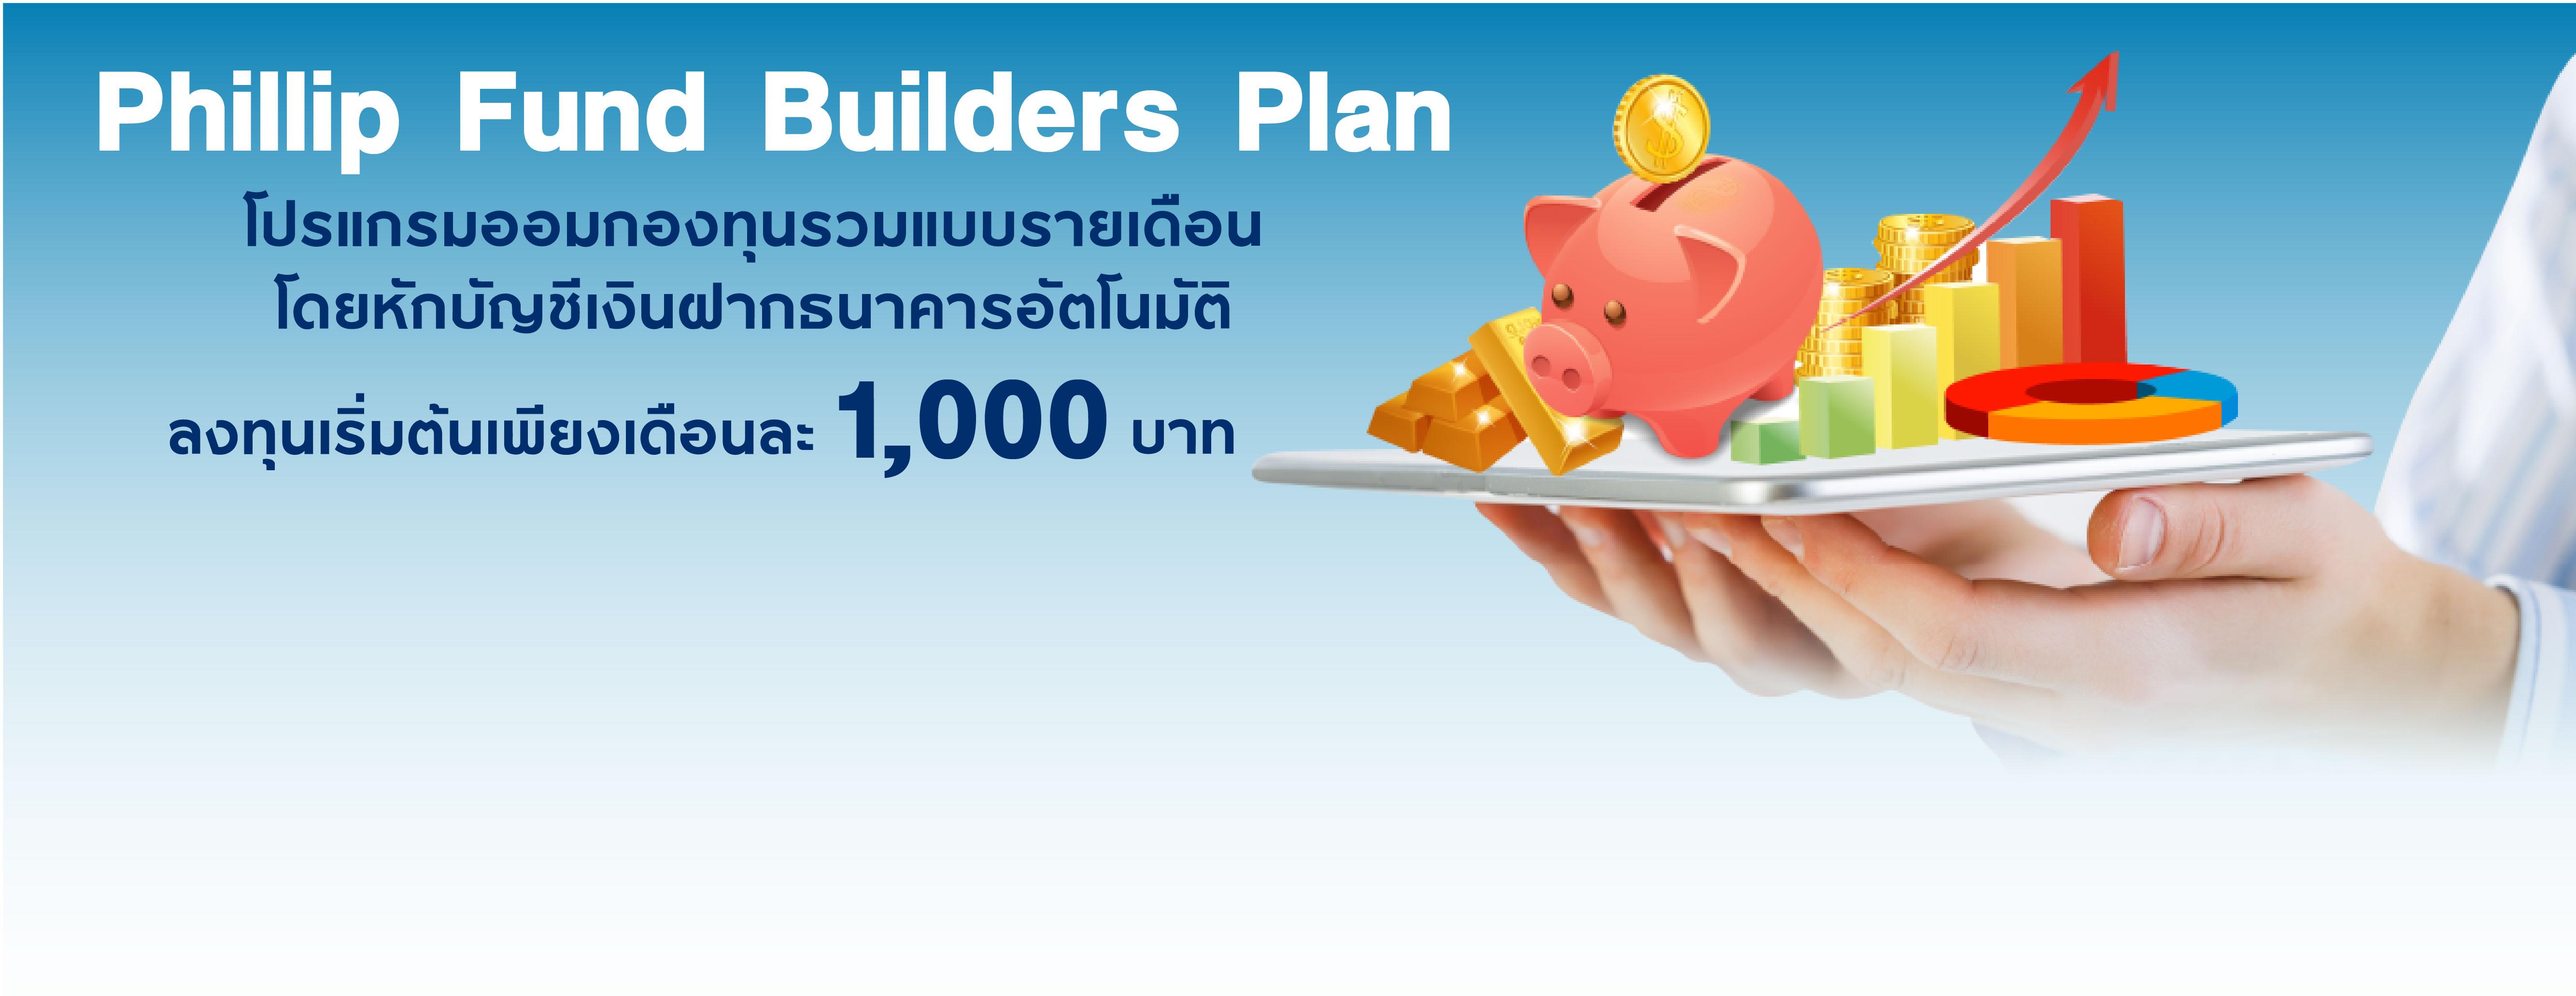 Fund Builders Plan ประจำไตรมาสที่ 2 ของปี 2563